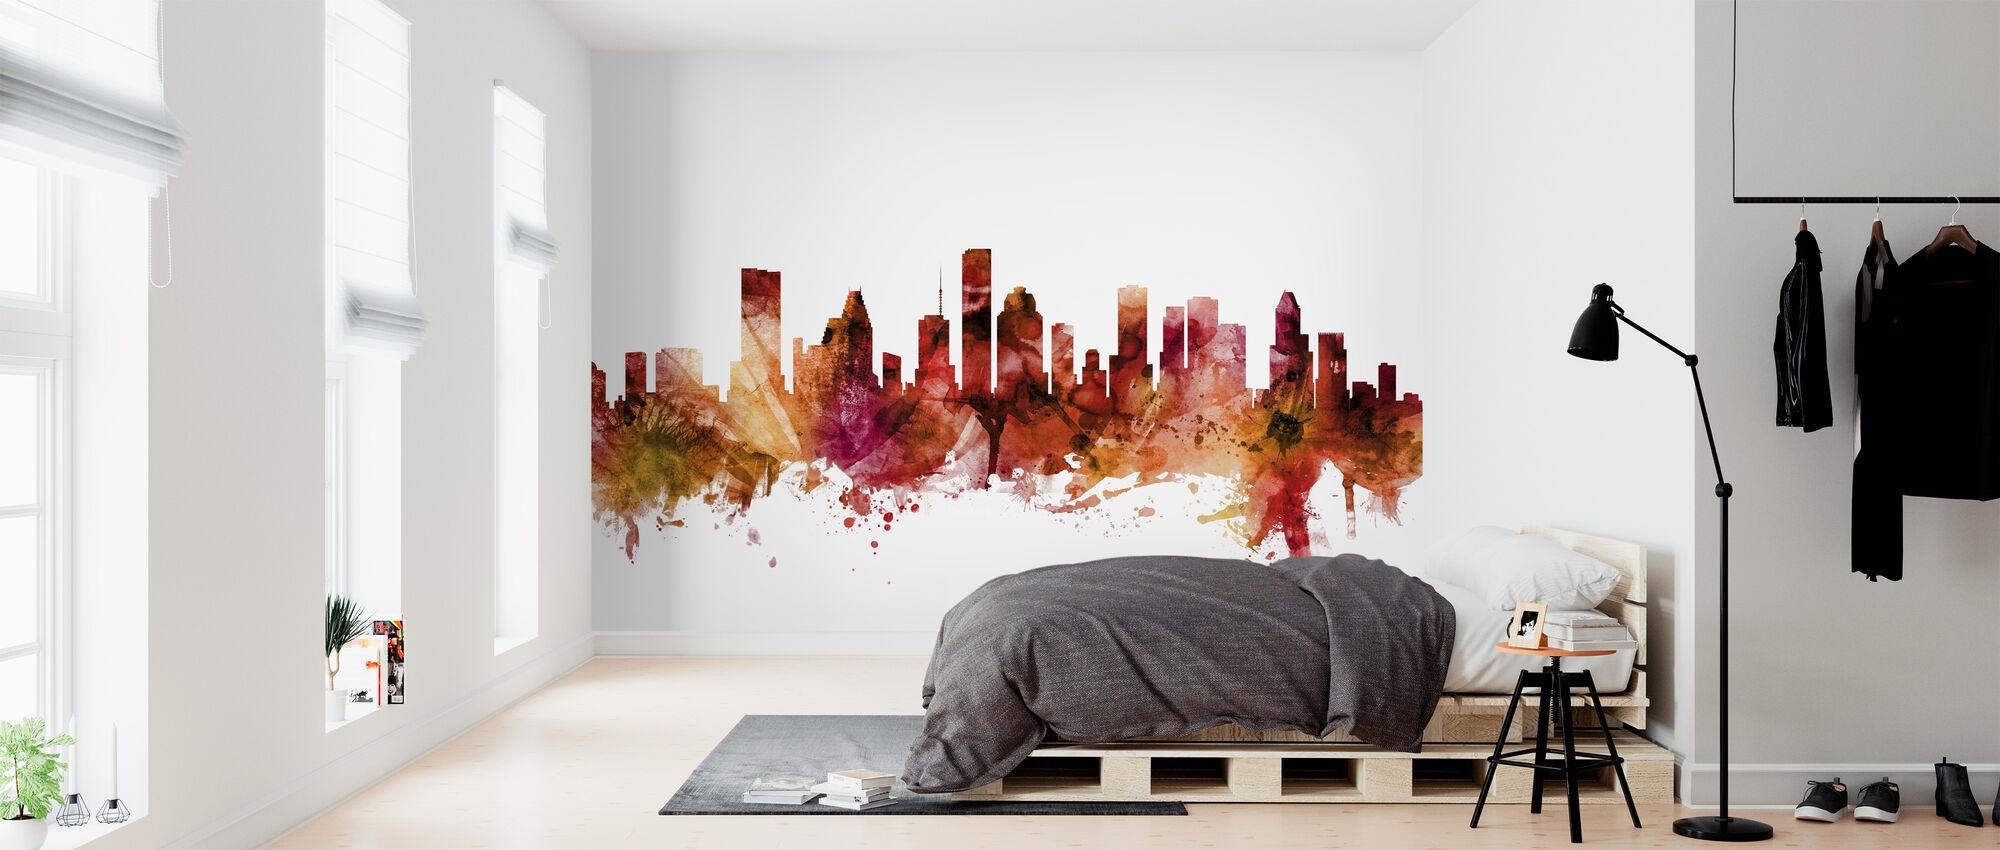 Houston Texas Skyline - Wallpaper - Bedroom